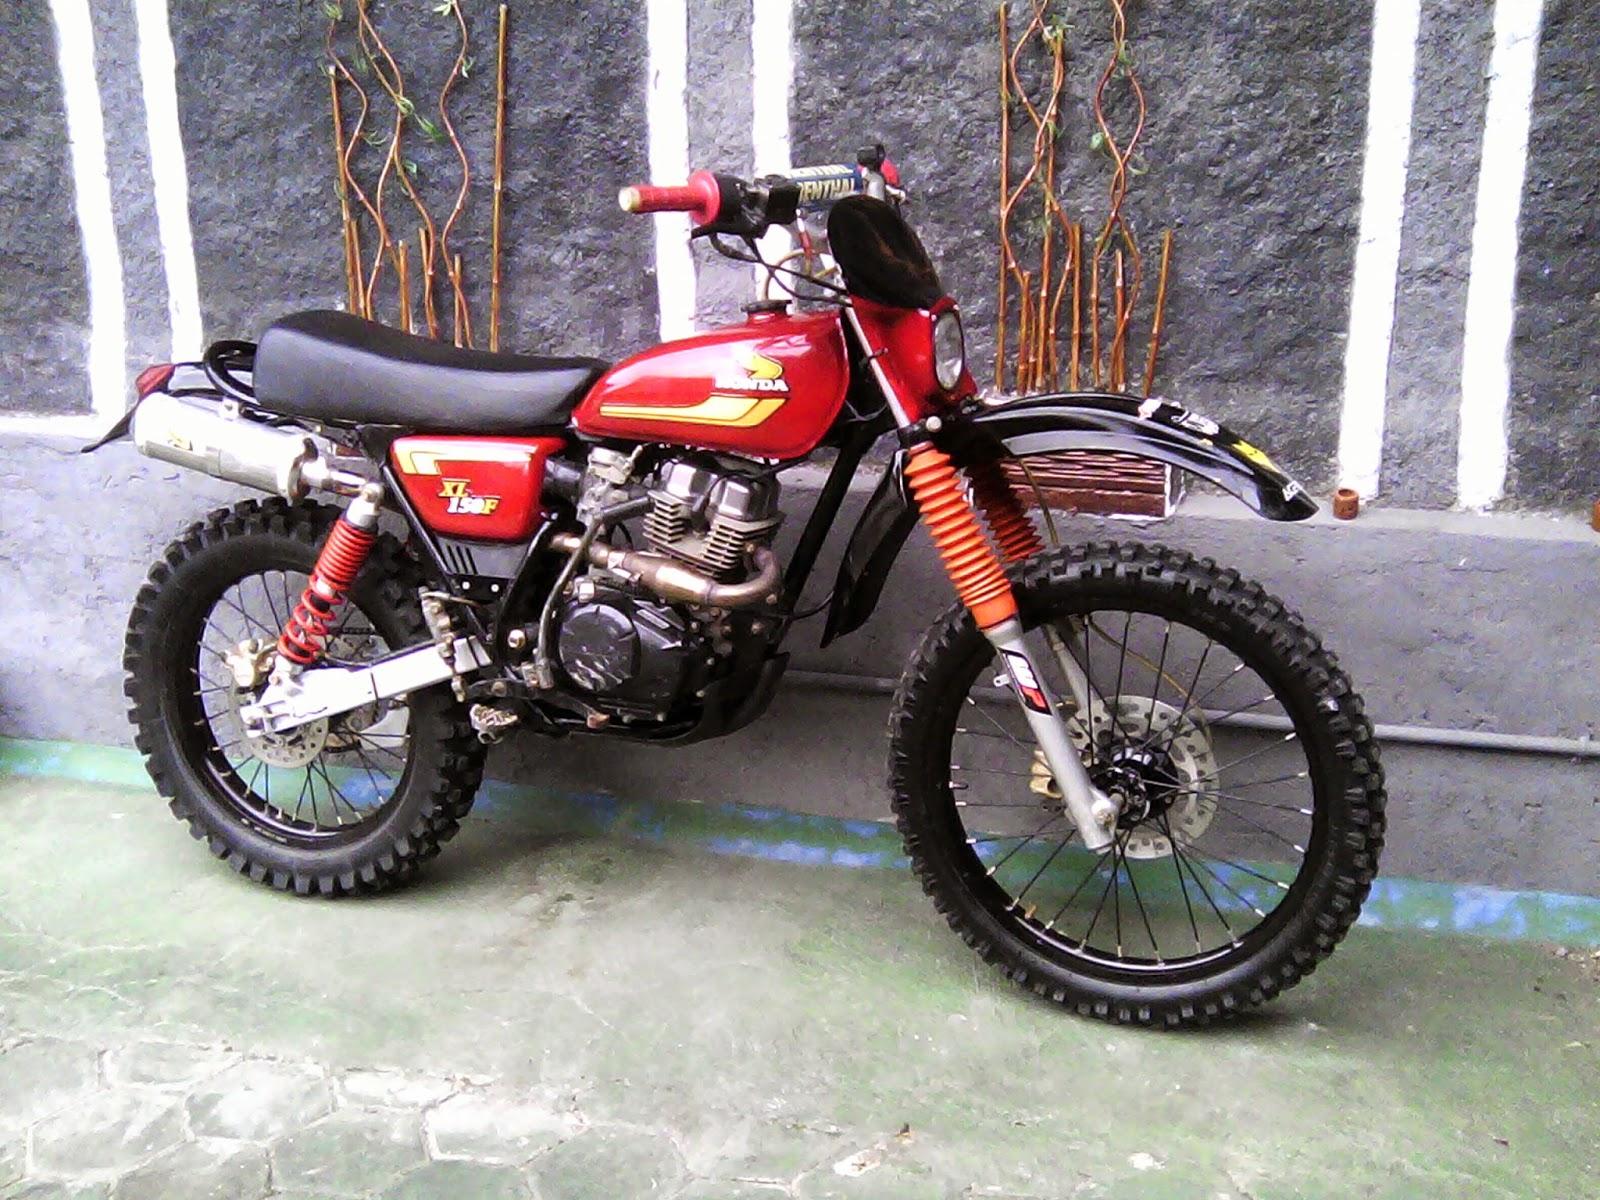 Modifikasi Motor Suzuki Jadul >> 39 GARAGE vintage trail equipment: MODIFIKASI TRAIL KLASIK VINTAGE ENDURO ( VINDURO ) BY 39 ...